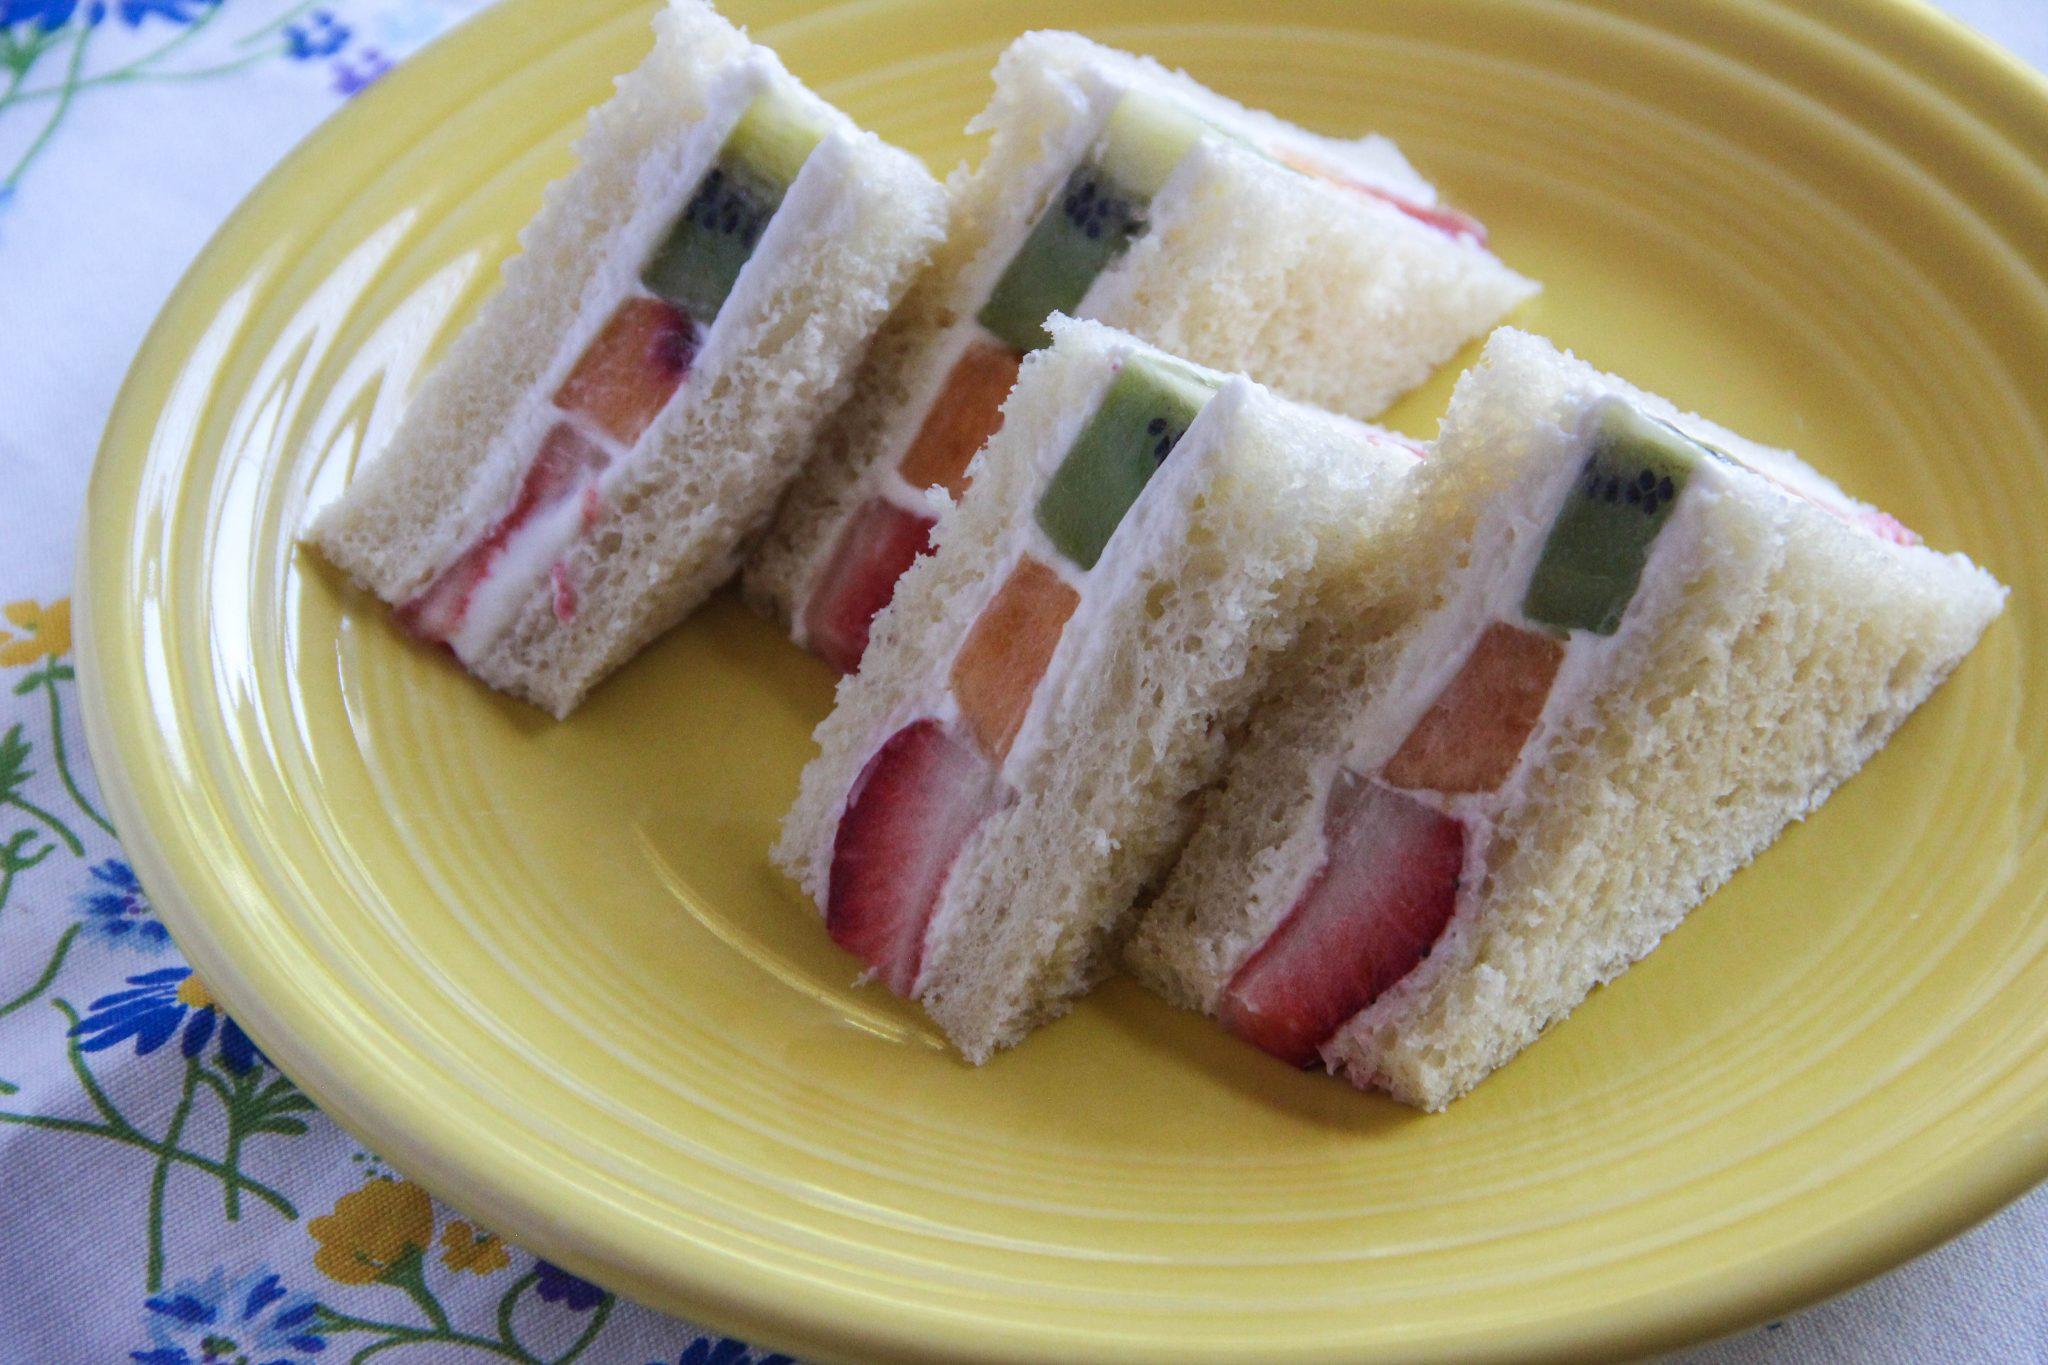 Dessert japanese cooking 101 fruit sandwich recipe forumfinder Choice Image